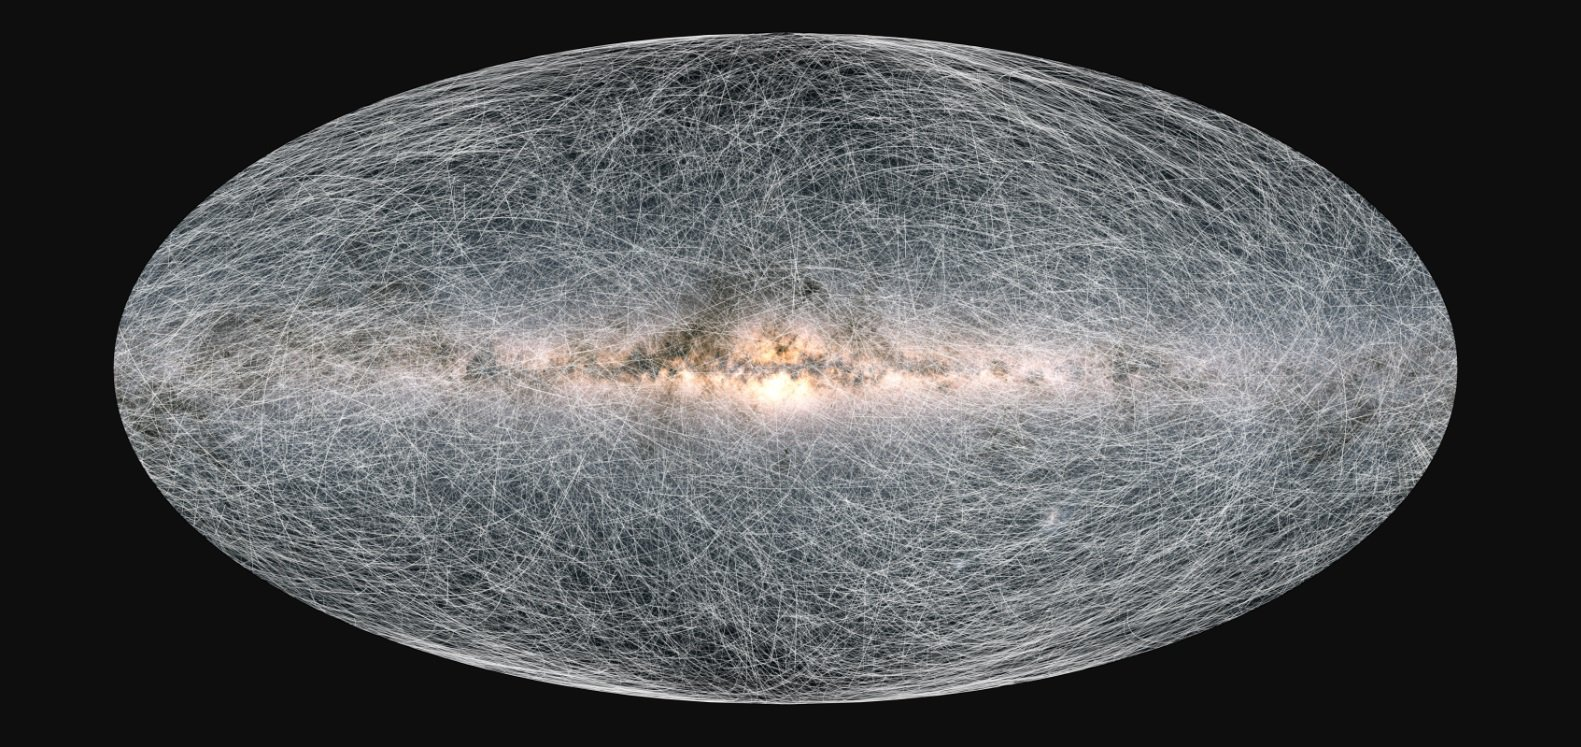 На нову мапу Чумацького Шляху нанесли майже 2 млрд зірок - Чумацький шлях, телескоп, Сонячна система, зірки, галактики, галактика - 06 karta